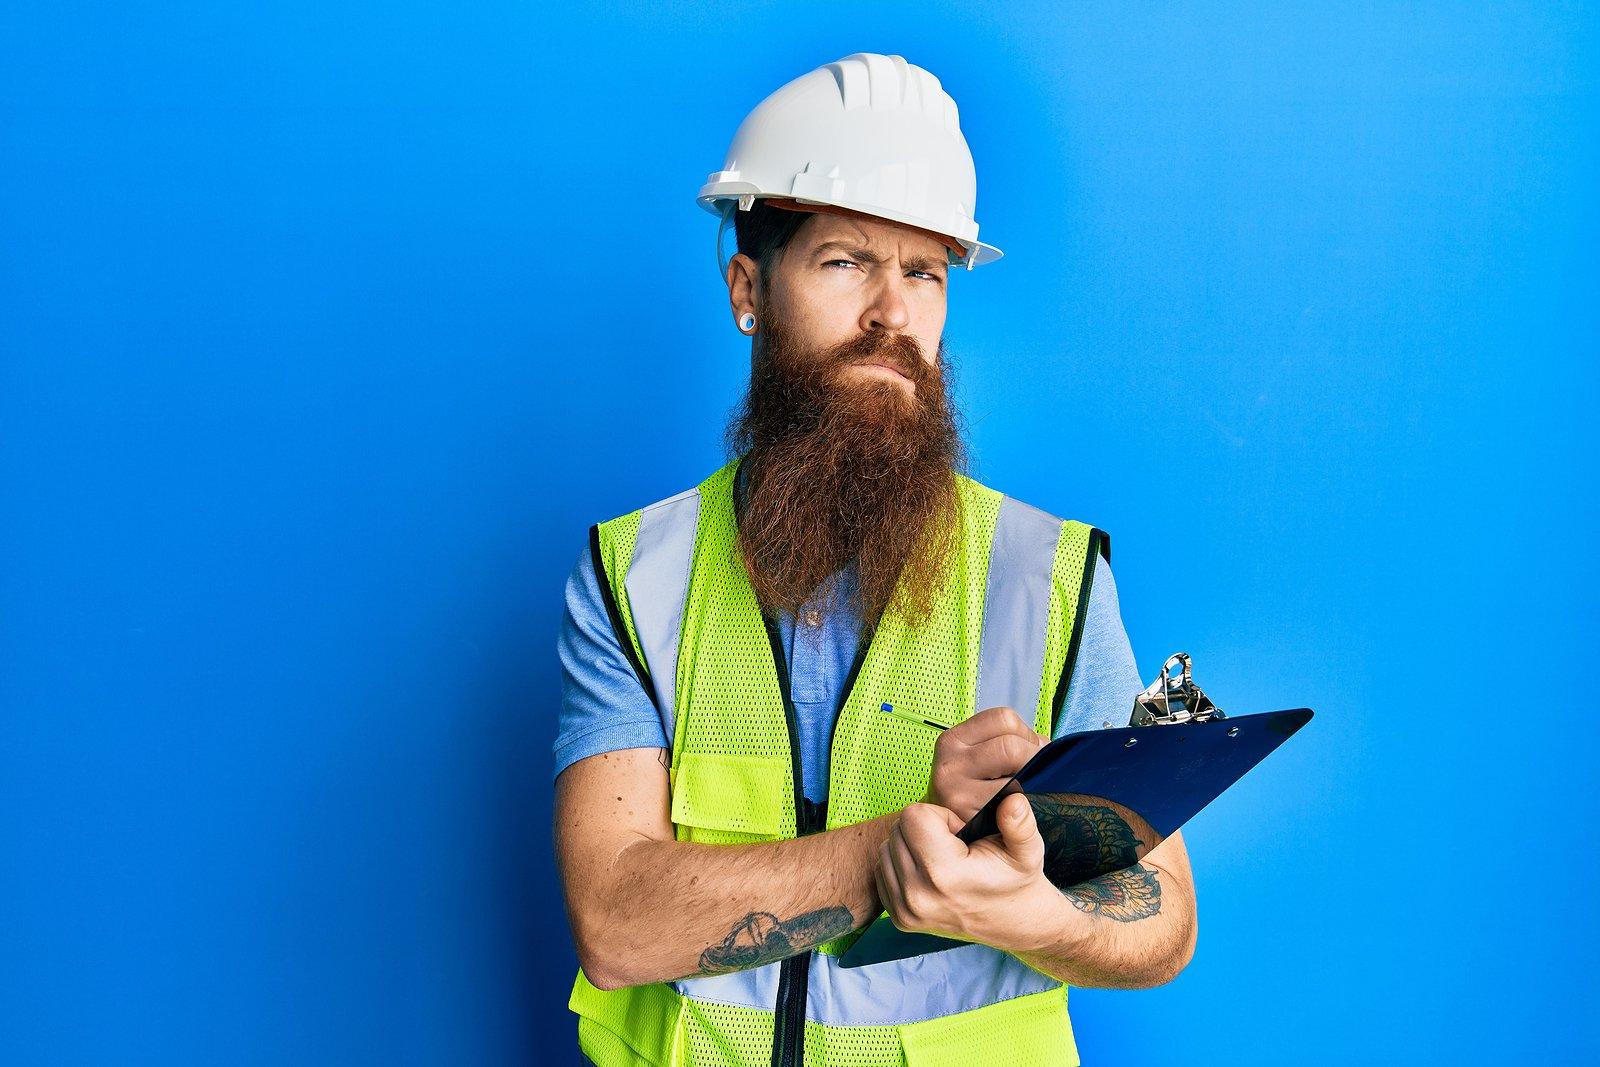 bigstock-Redhead-man-with-long-beard-we-421807265